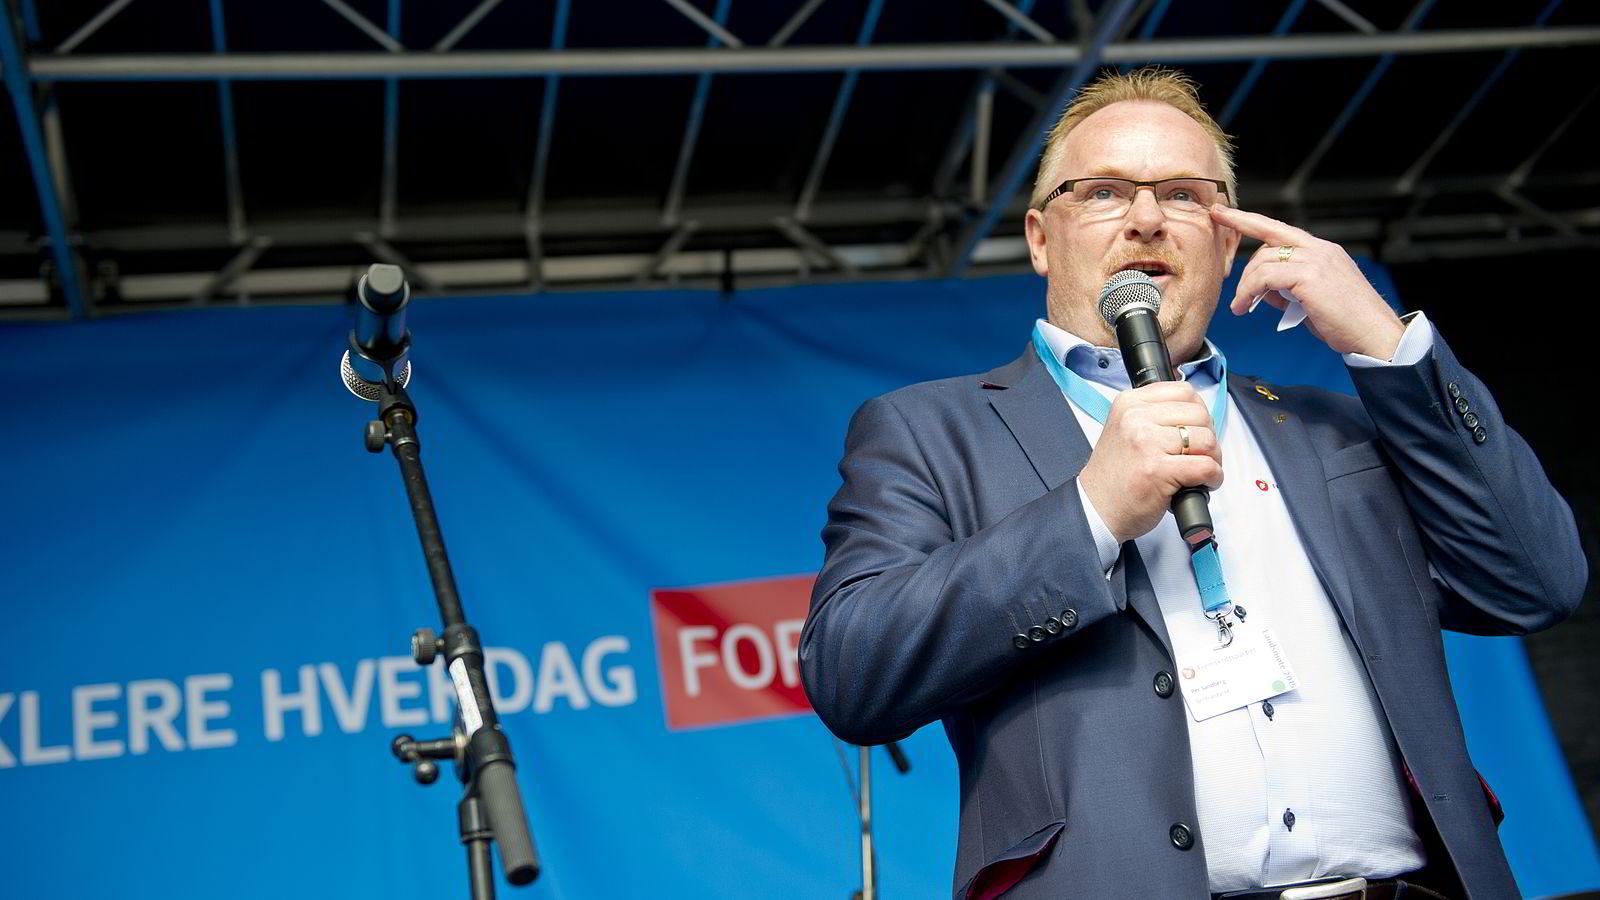 Nestleder i FrP Per Sandberg holder appell på Jessheim torg i forbindelse med 1.mai-markeringen under Fremskrittspartiets landsmøte.               Foto: Jon Olav Nesvold /